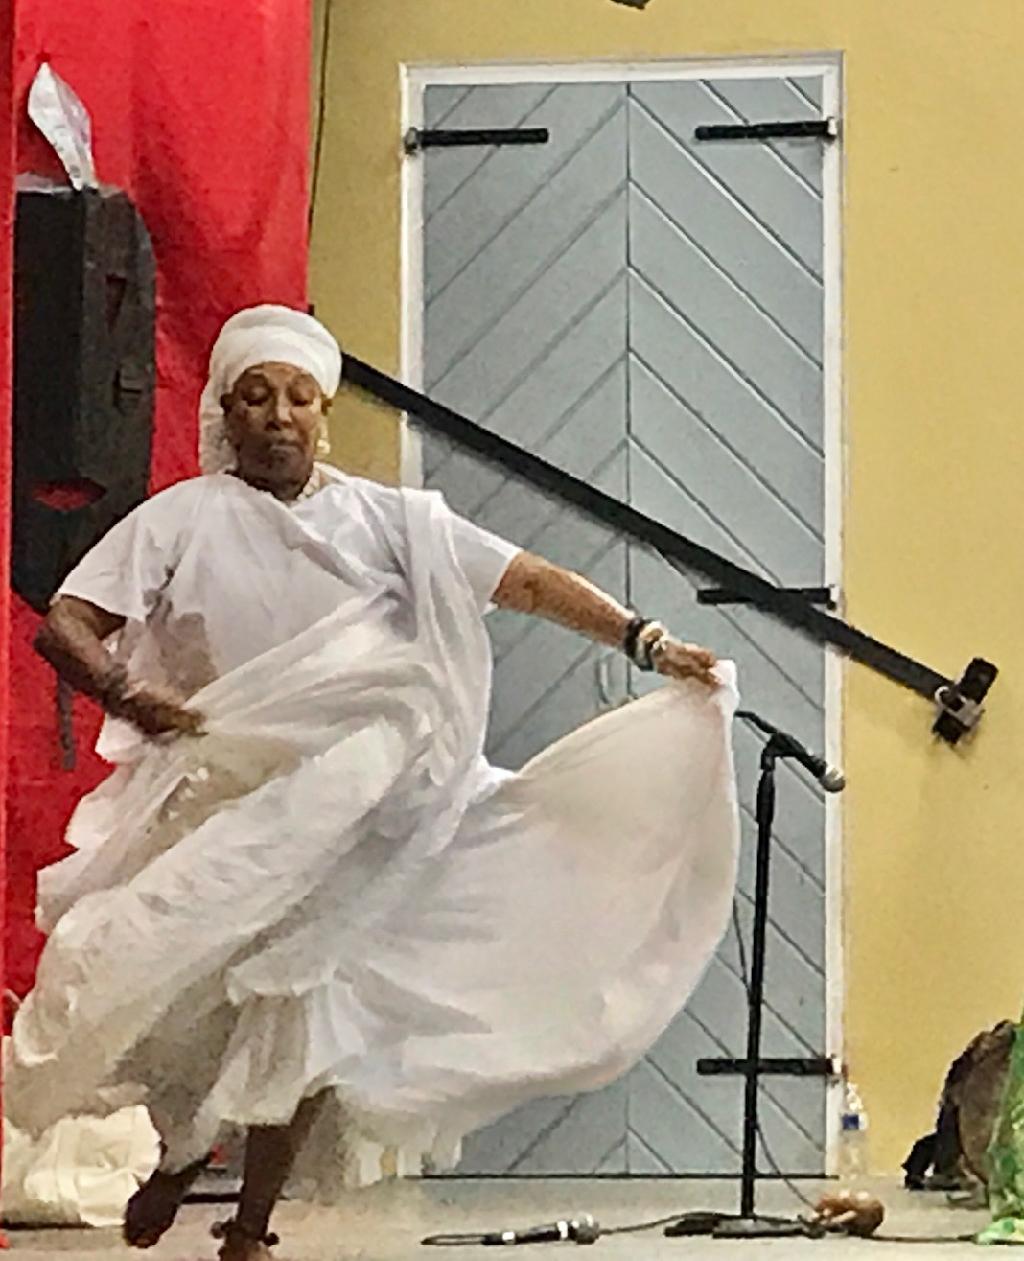 Chenzira Kahina Davis dances the Bamboula. (Source photo by Elisa McKay)